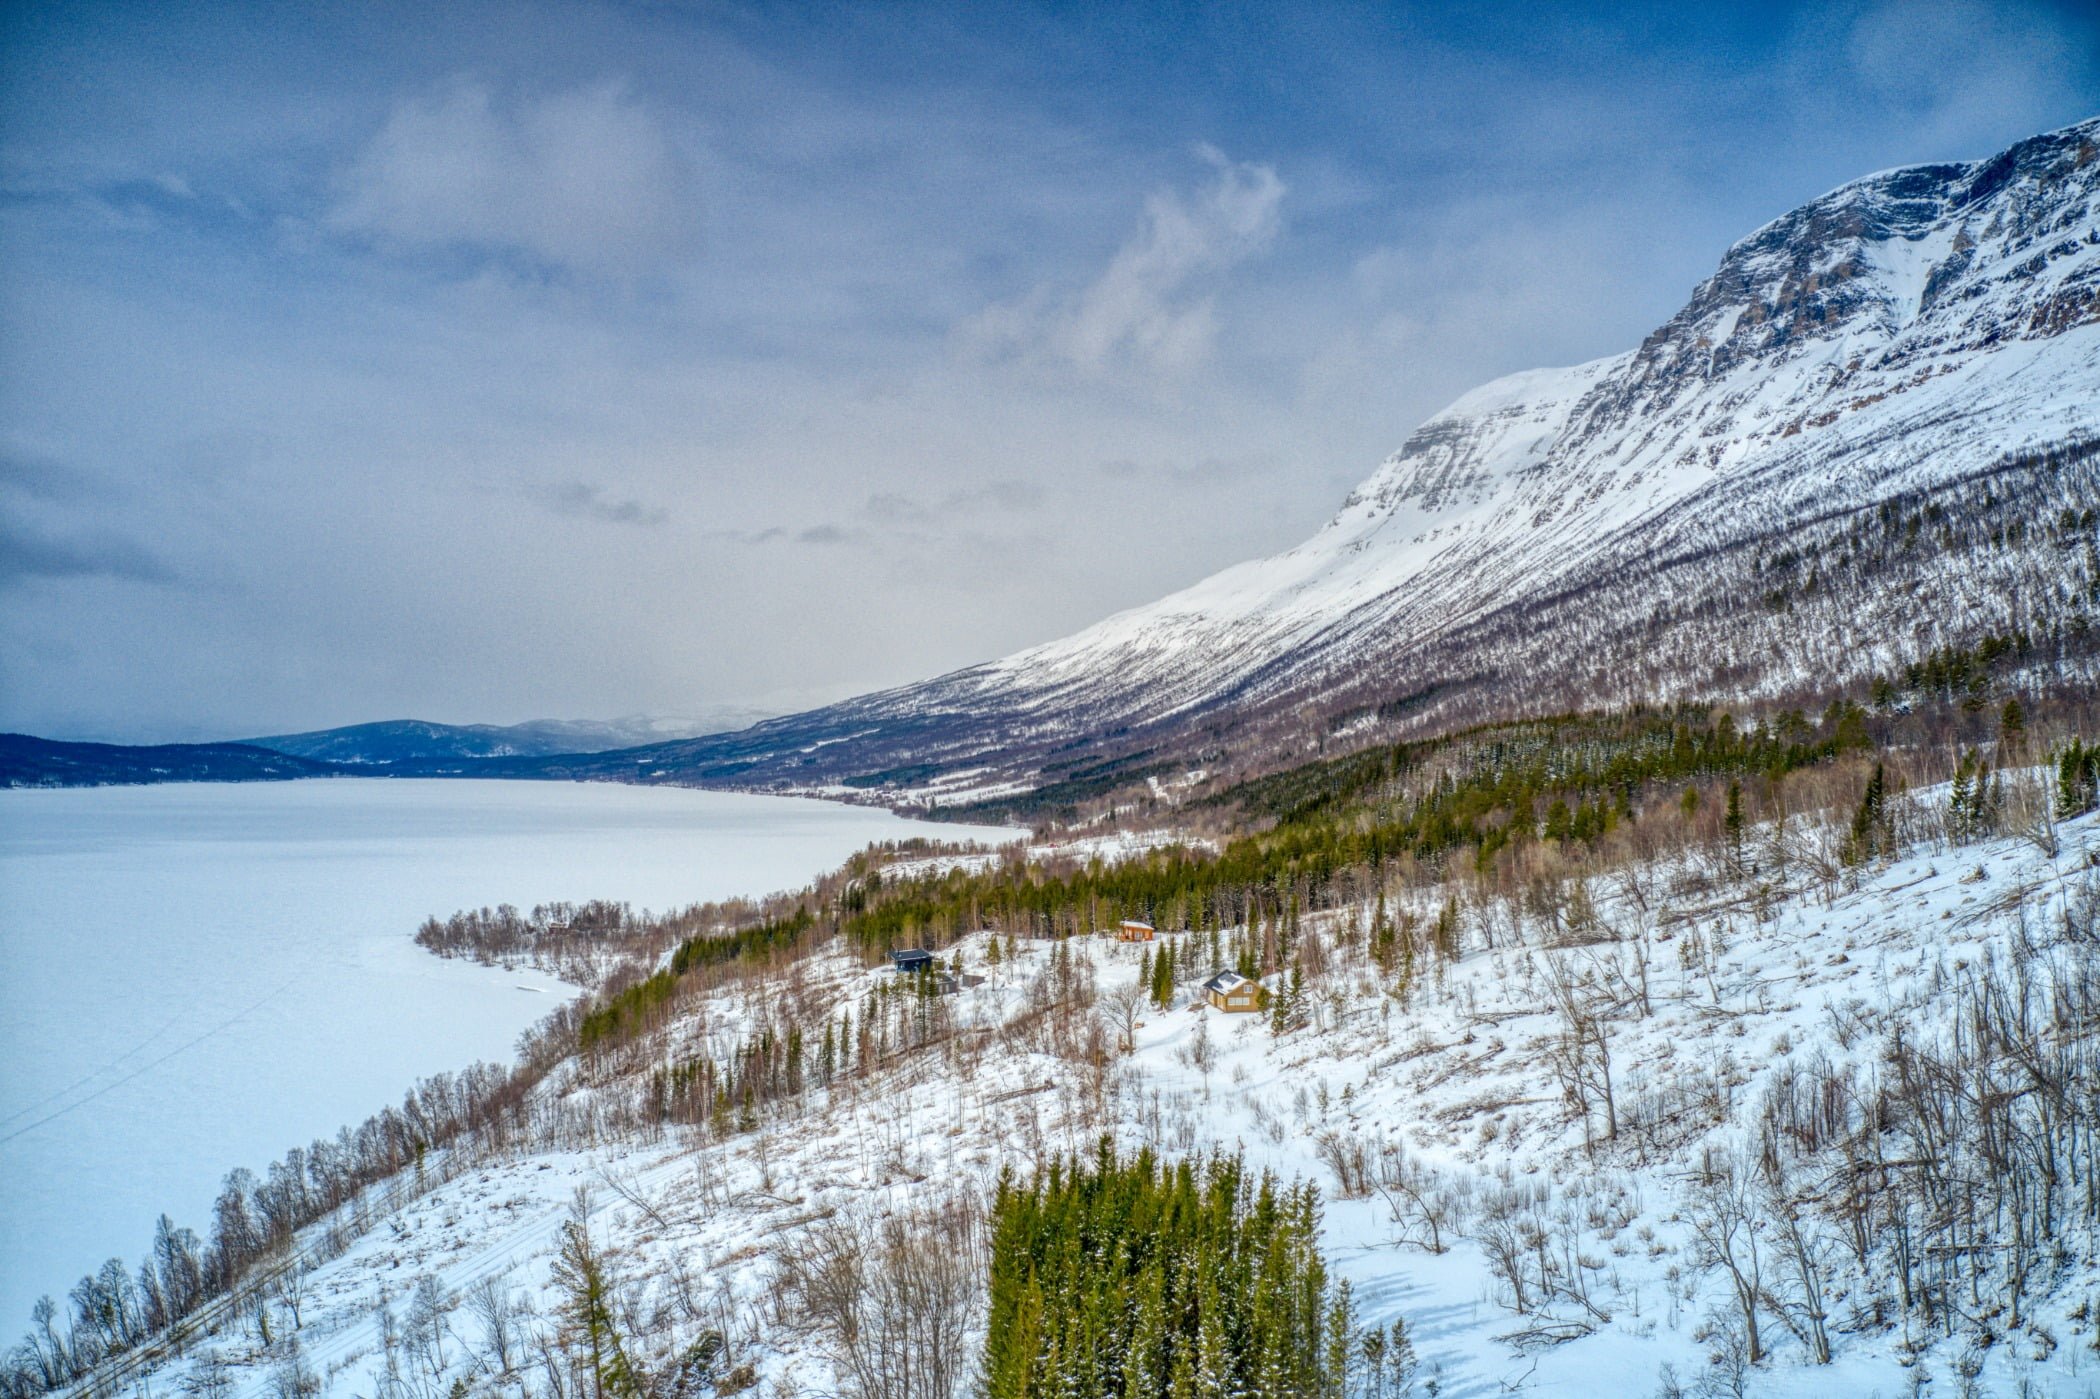 Natural landscape, Sky, Cloud, Snow, Mountain, Nature, Slope, Highland, Freezing, Plant